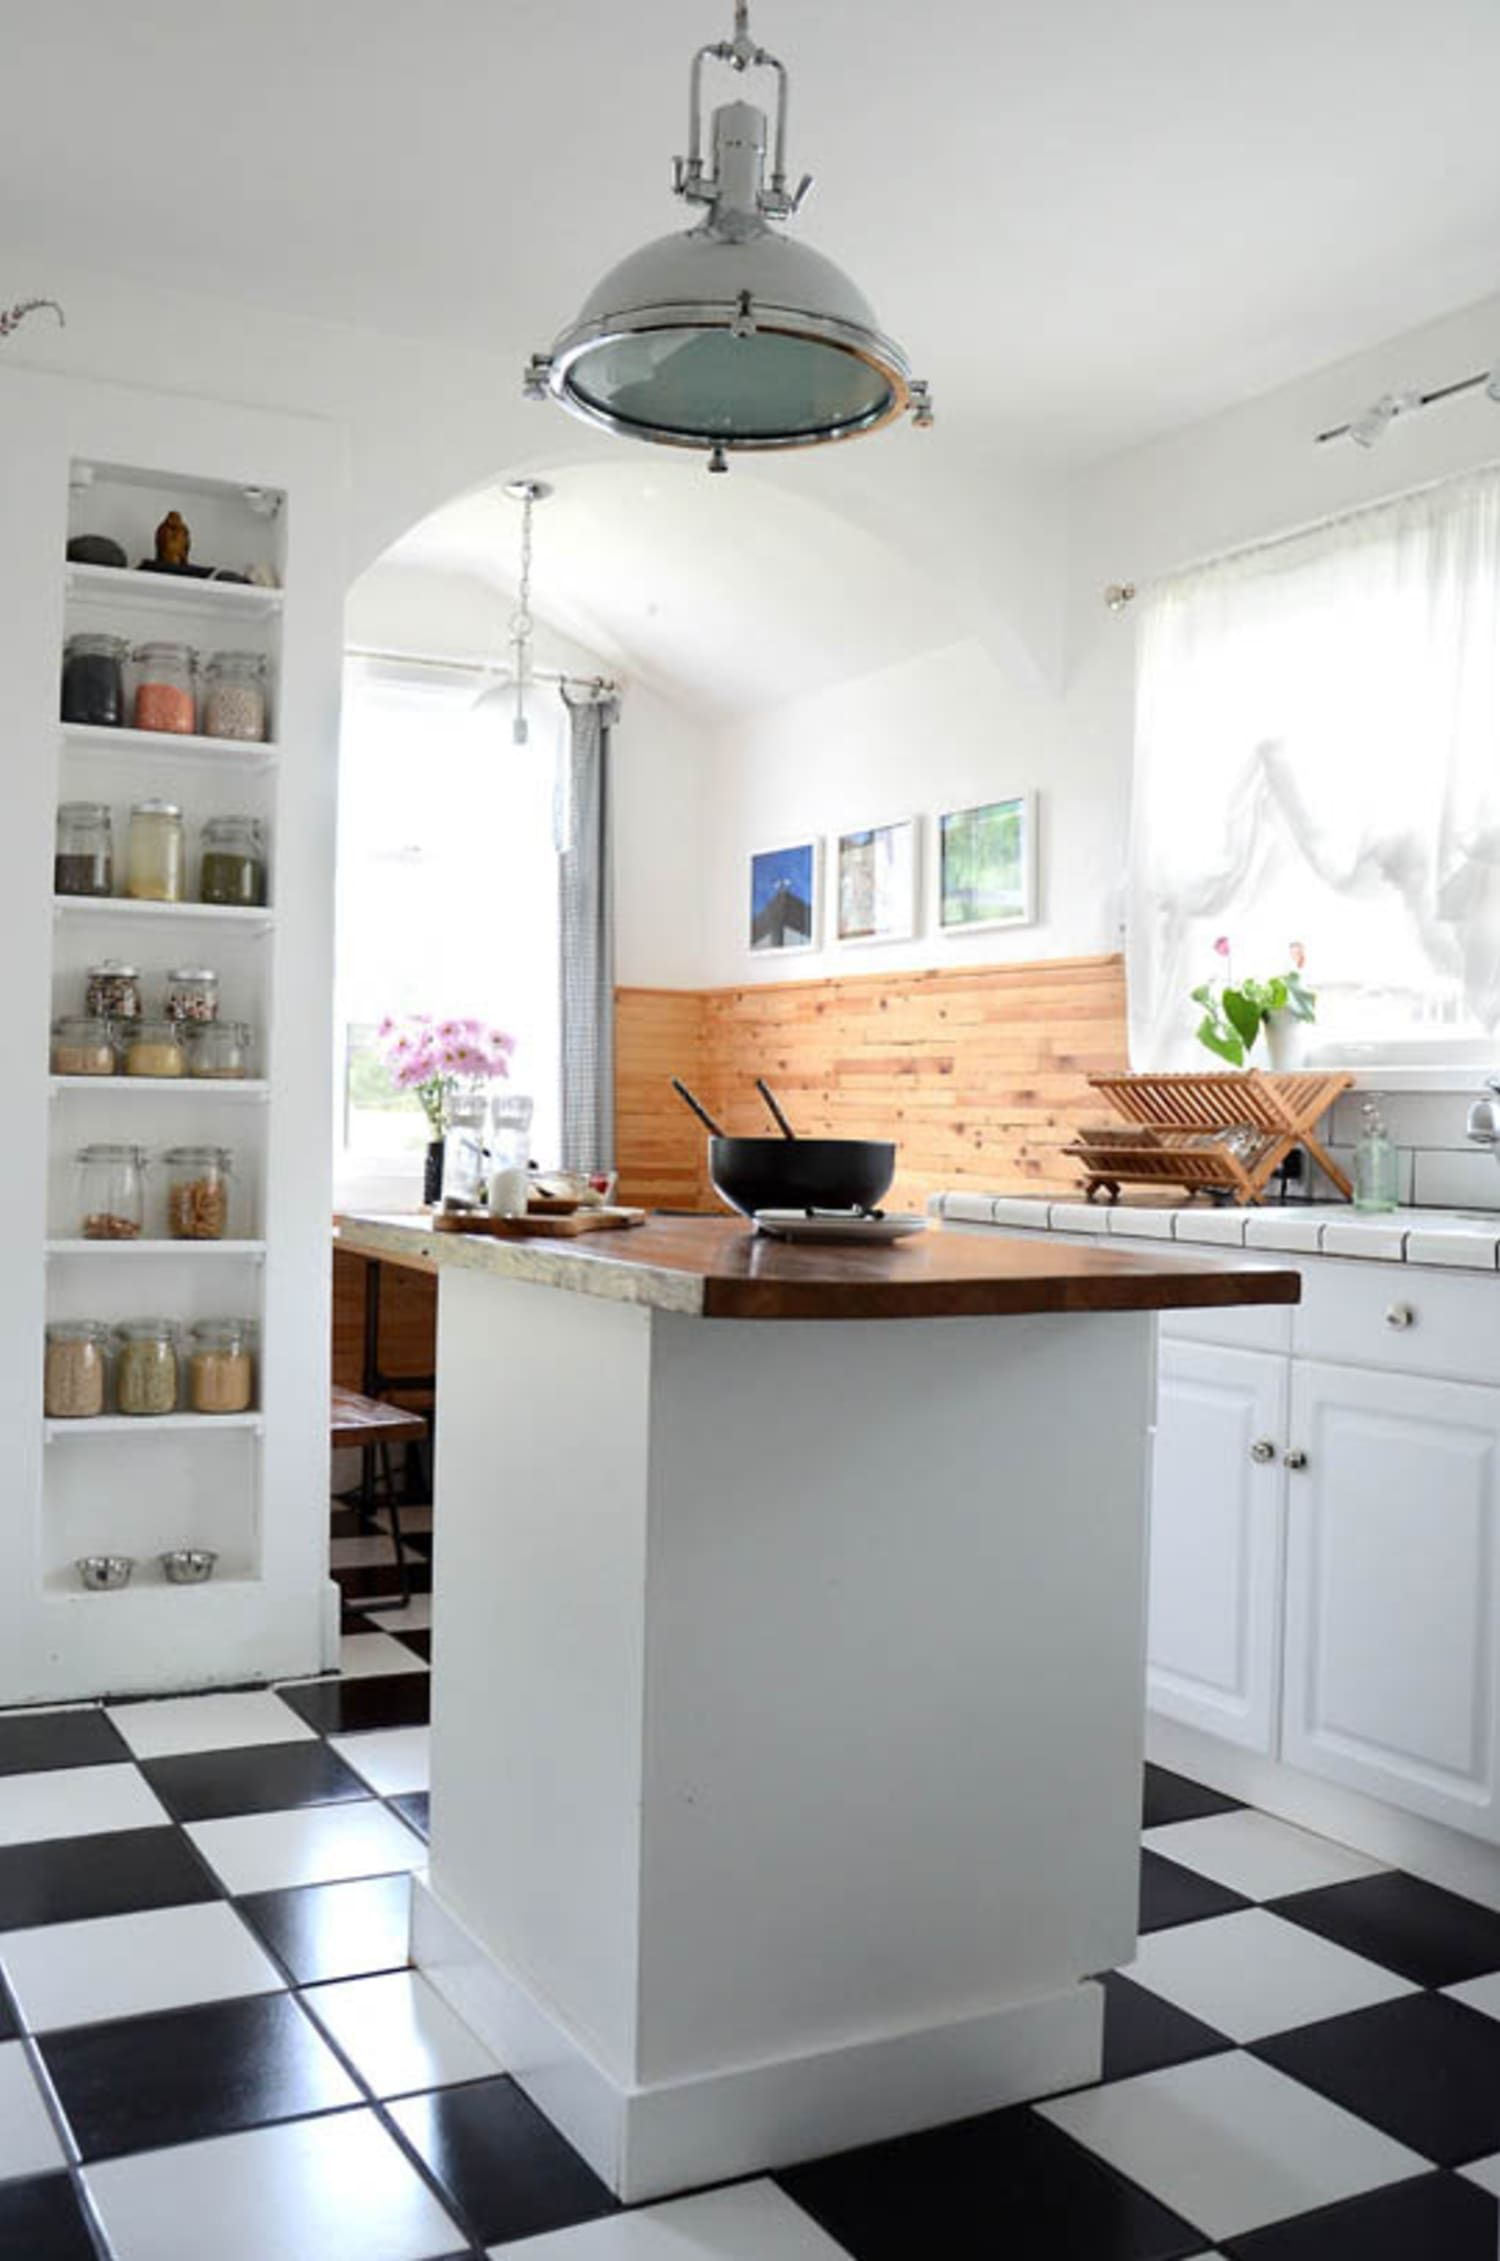 Kitchen Storage Between the Studs 5 Examples of Smart Recessed